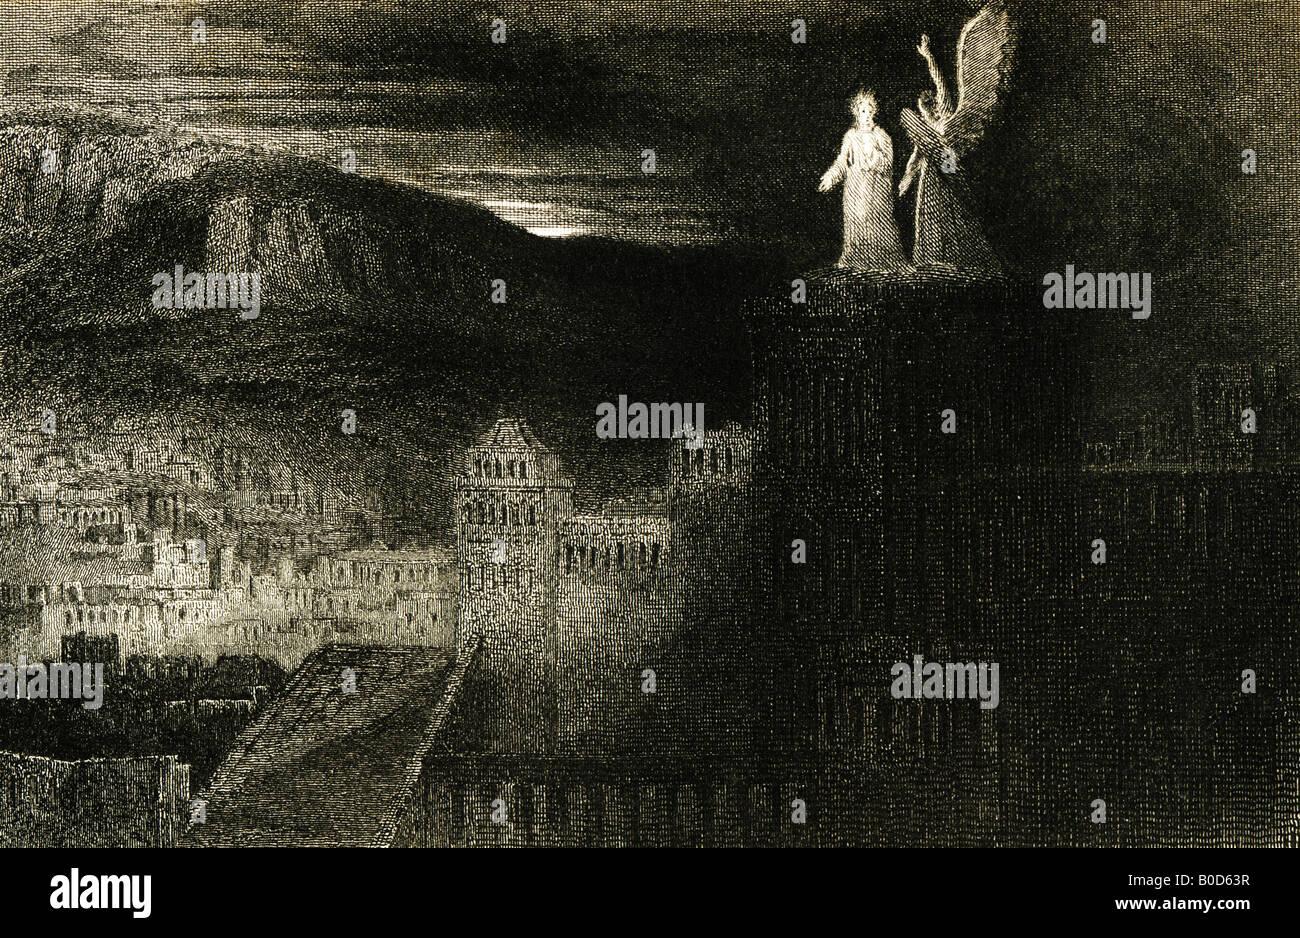 Grabado del siglo XIX la tercera tentación 1835 a partir de un cuadro pintado por J Martin de John Milton's Imagen De Stock